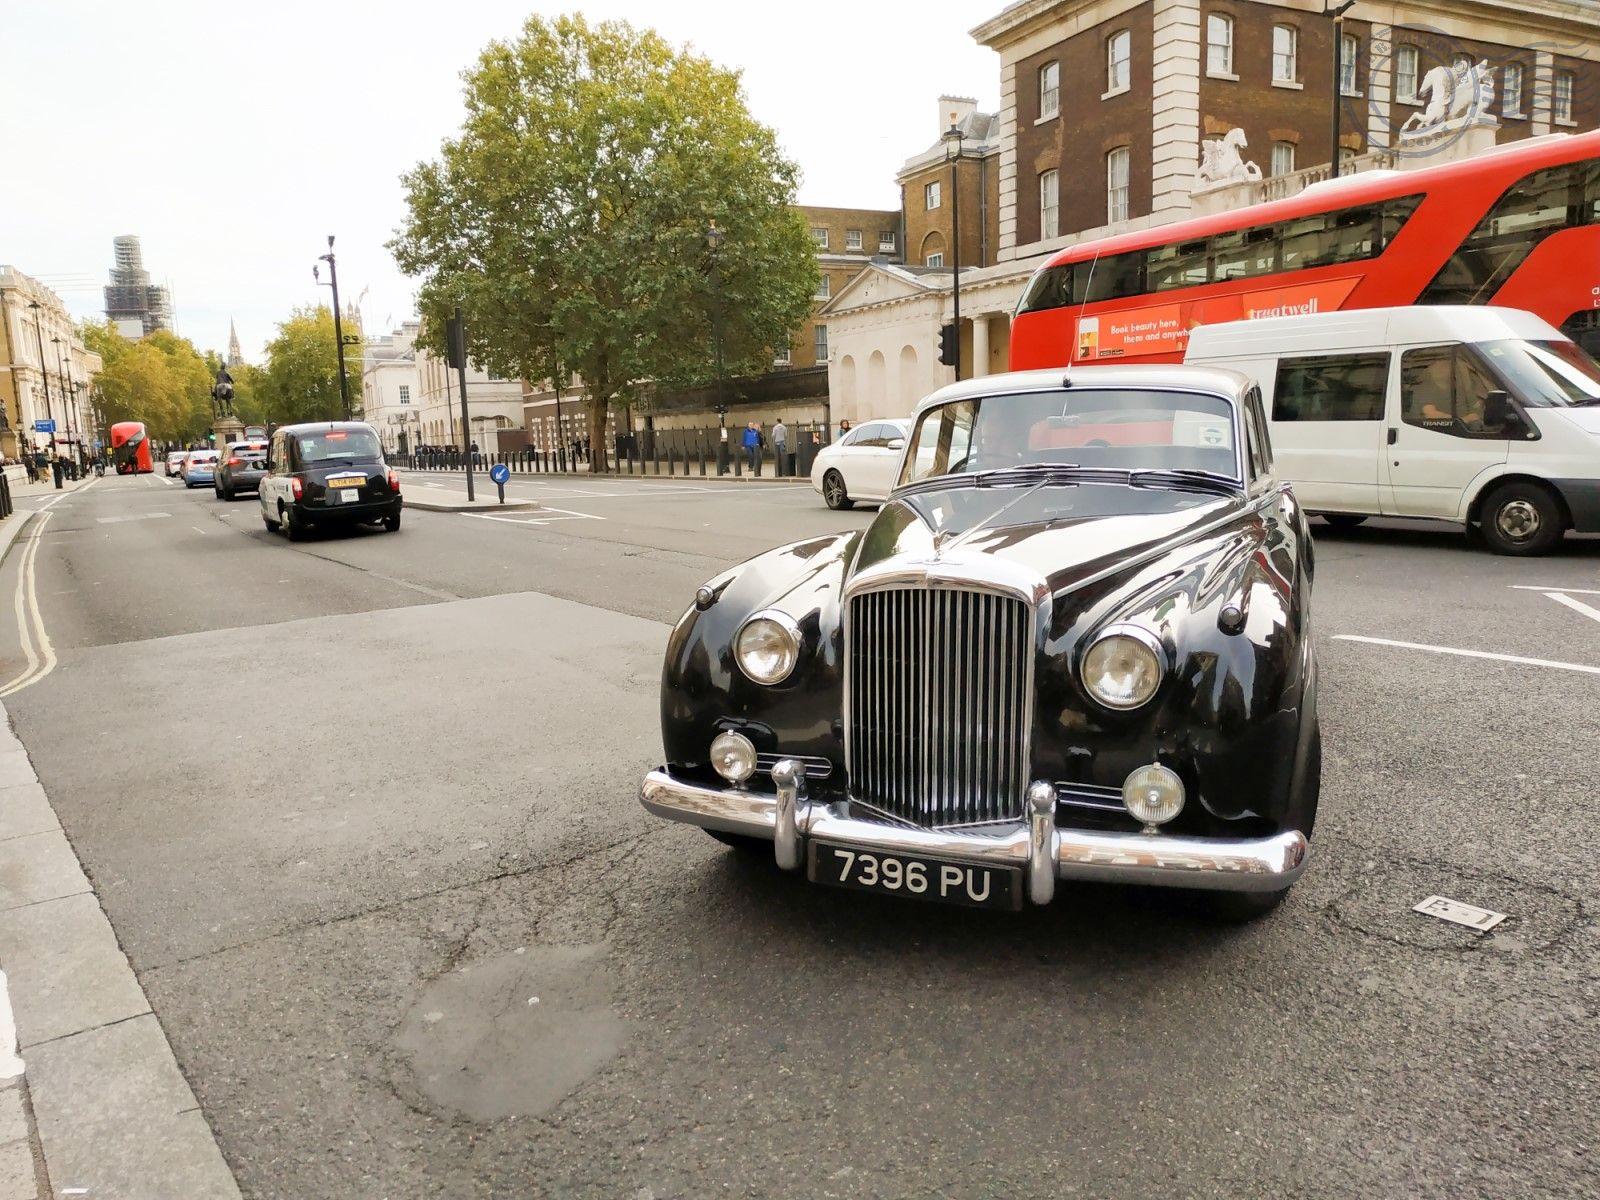 London cars street